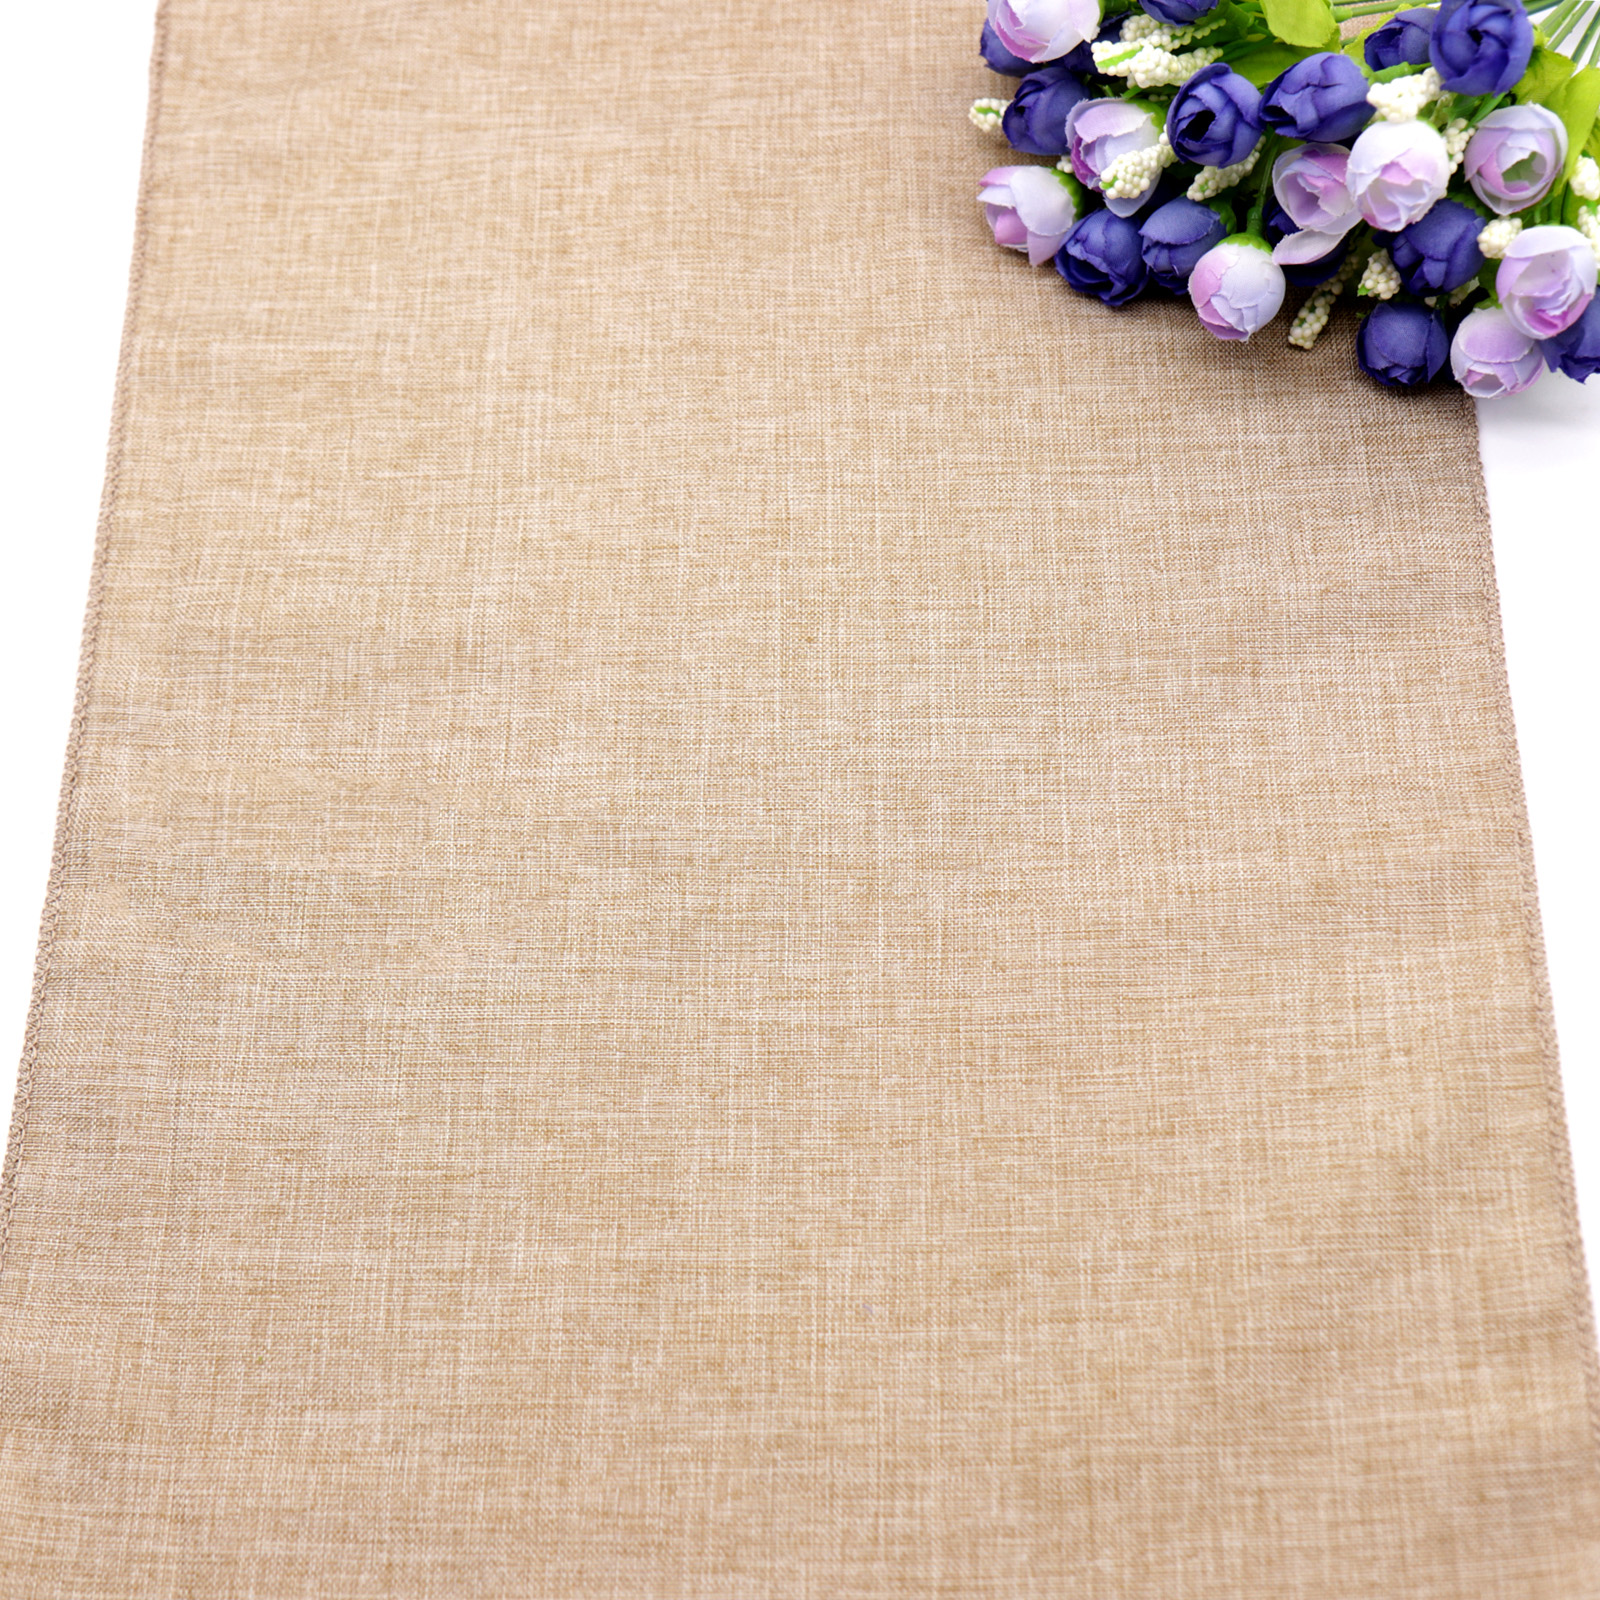 1pcs Modern Table Runner Rustic Imitation Linen Tablecloths For Christmas Camino De Mesa